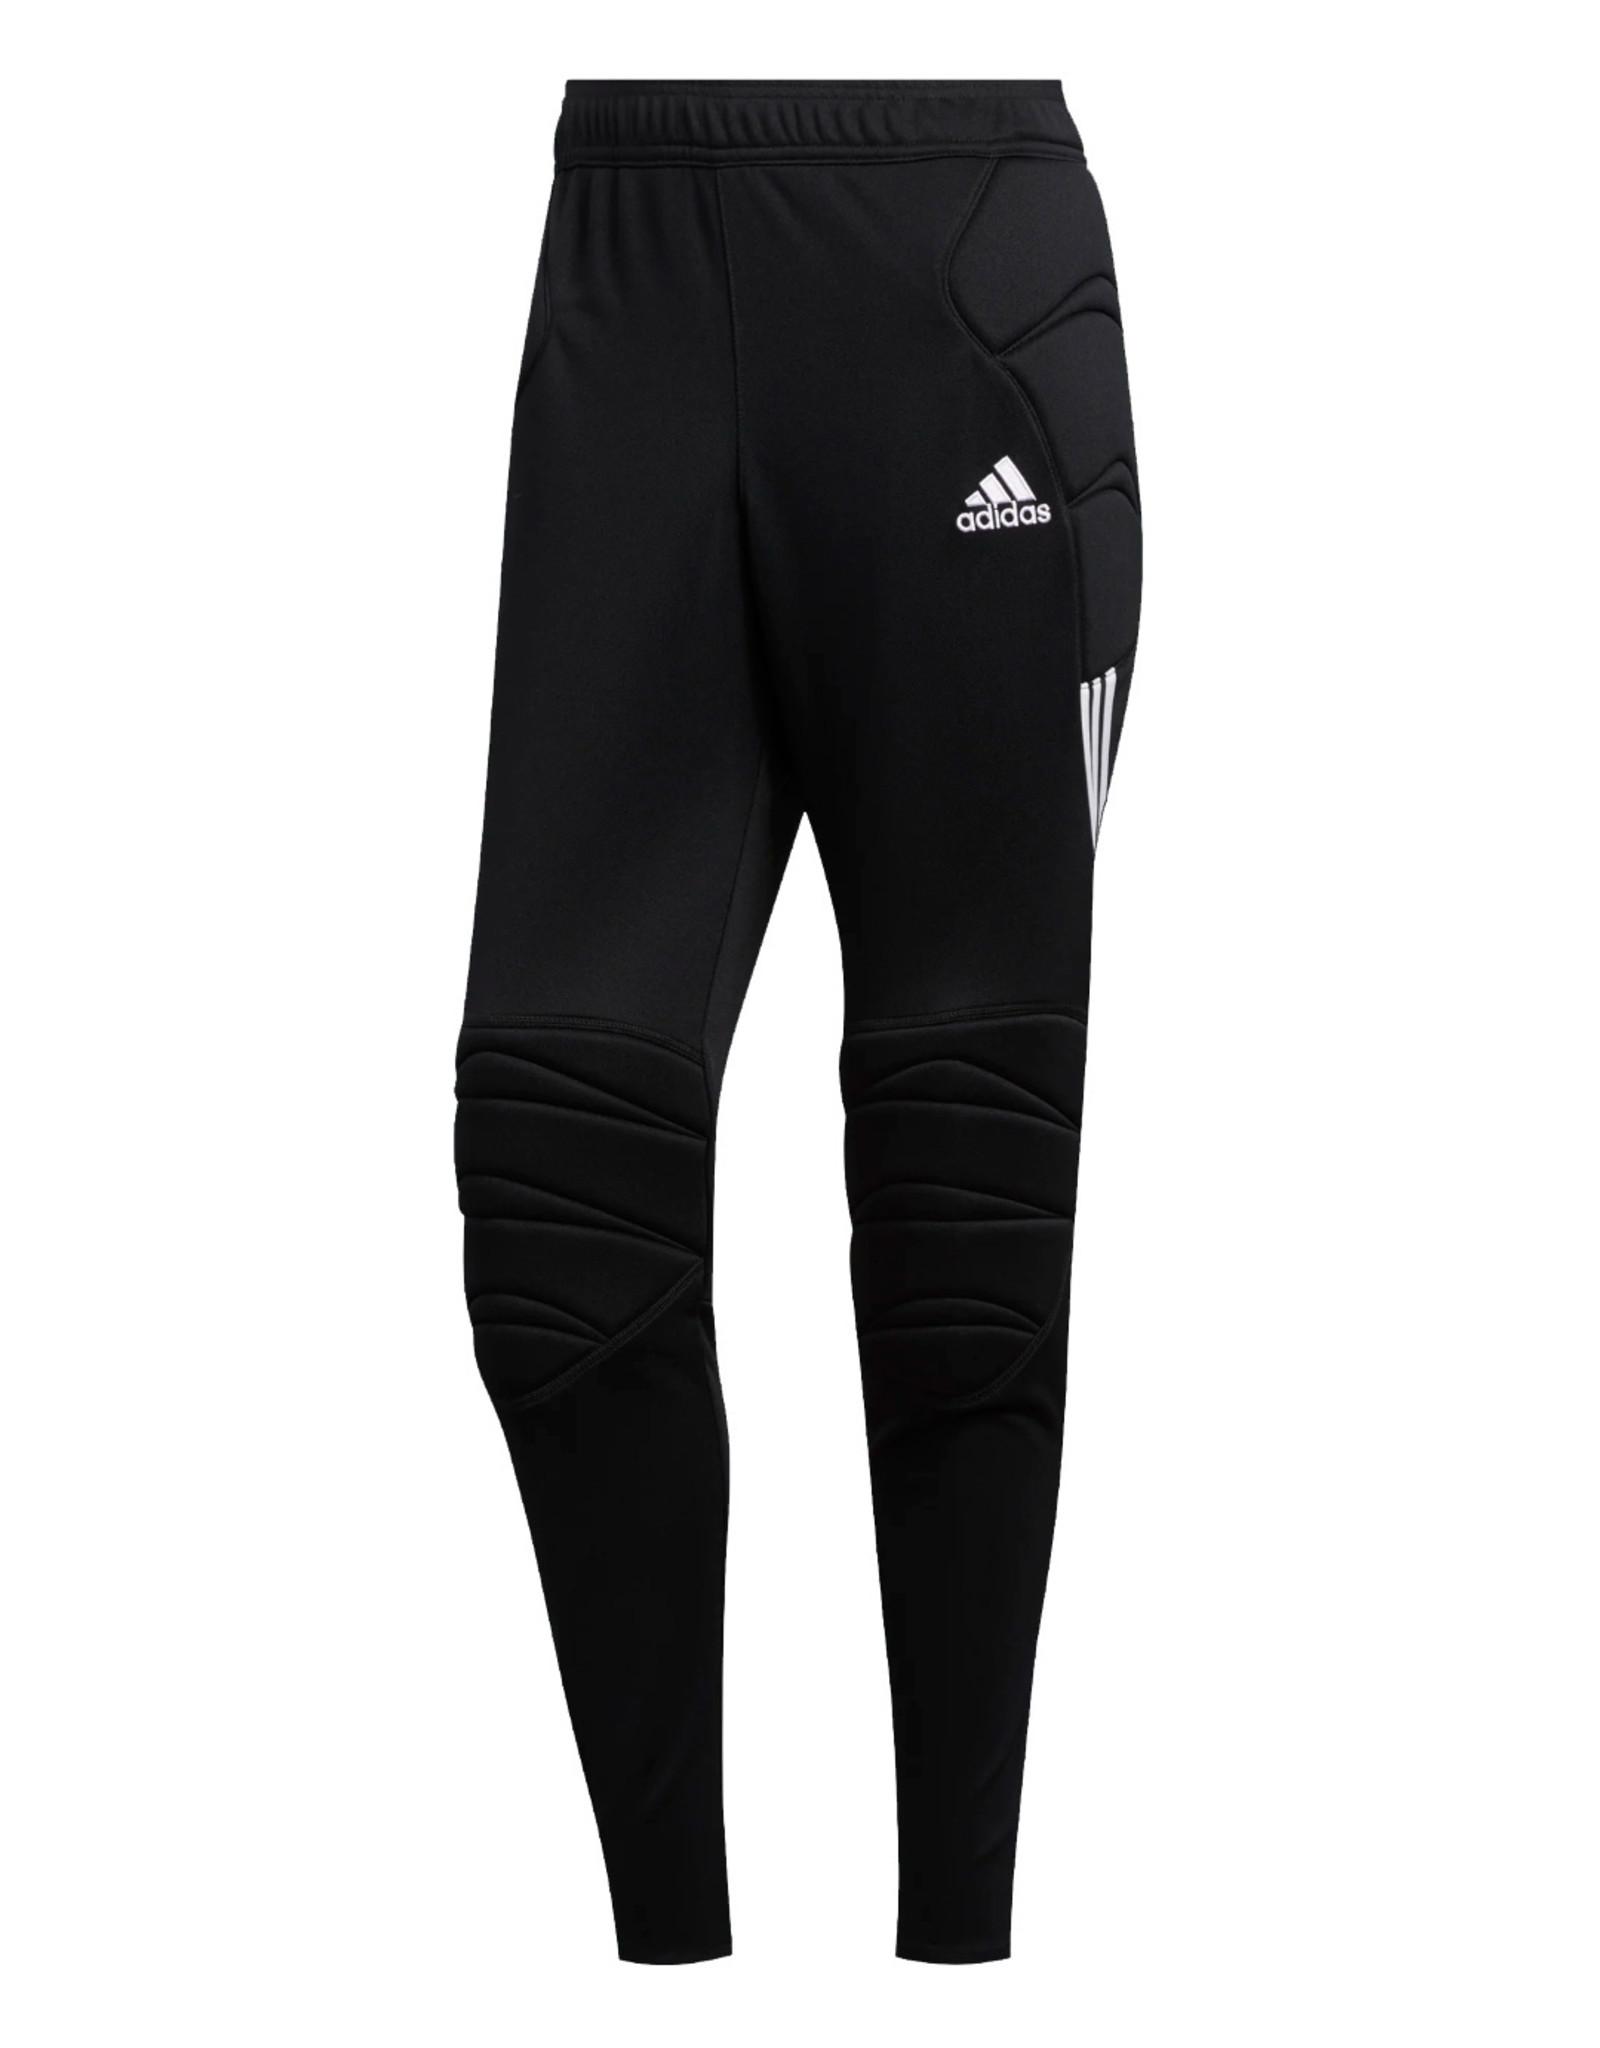 Adidas Adidas Tierro GK Pants